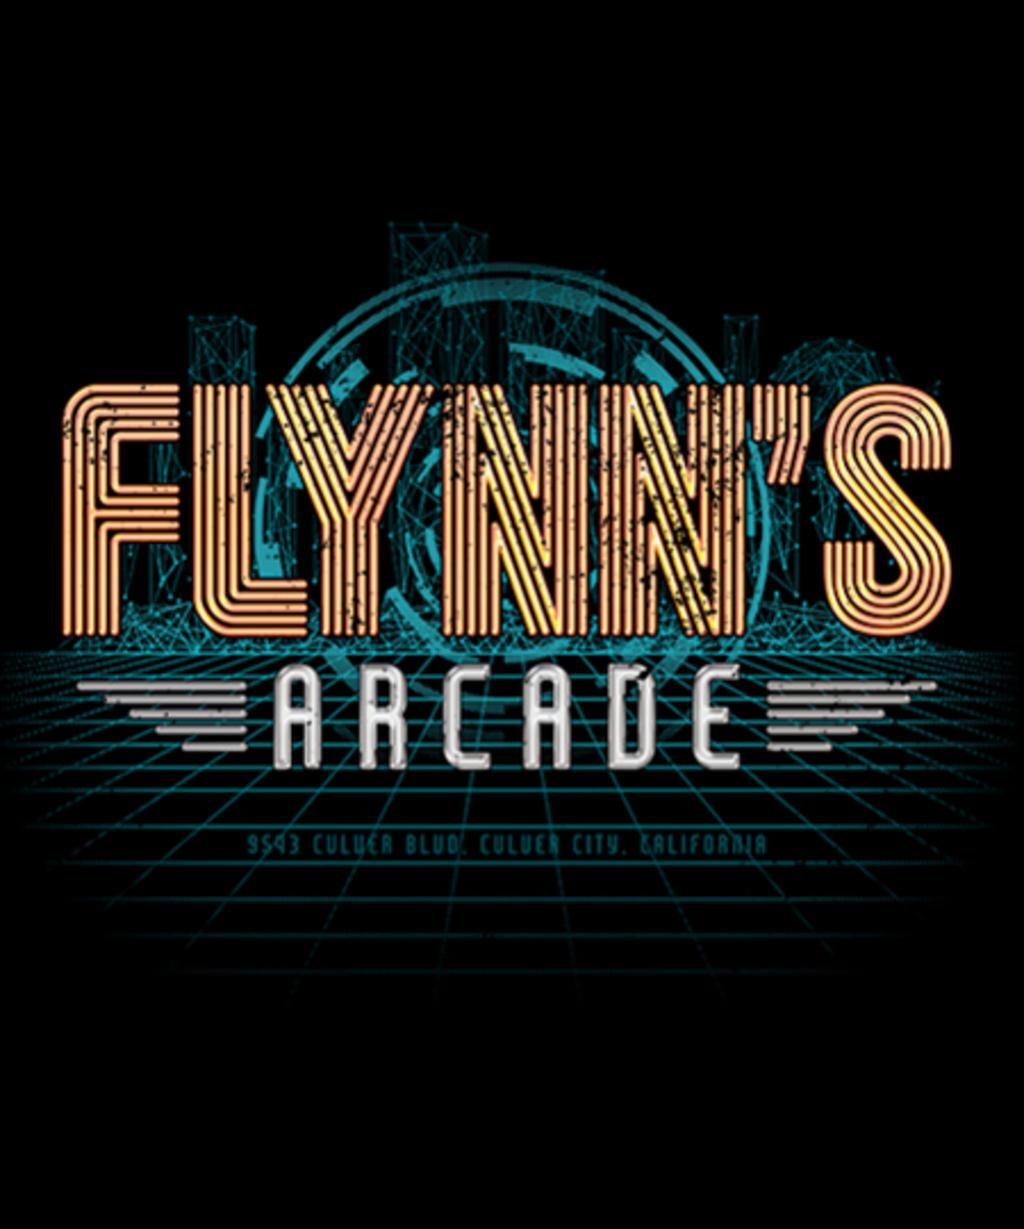 Qwertee: Flynn's Arcade